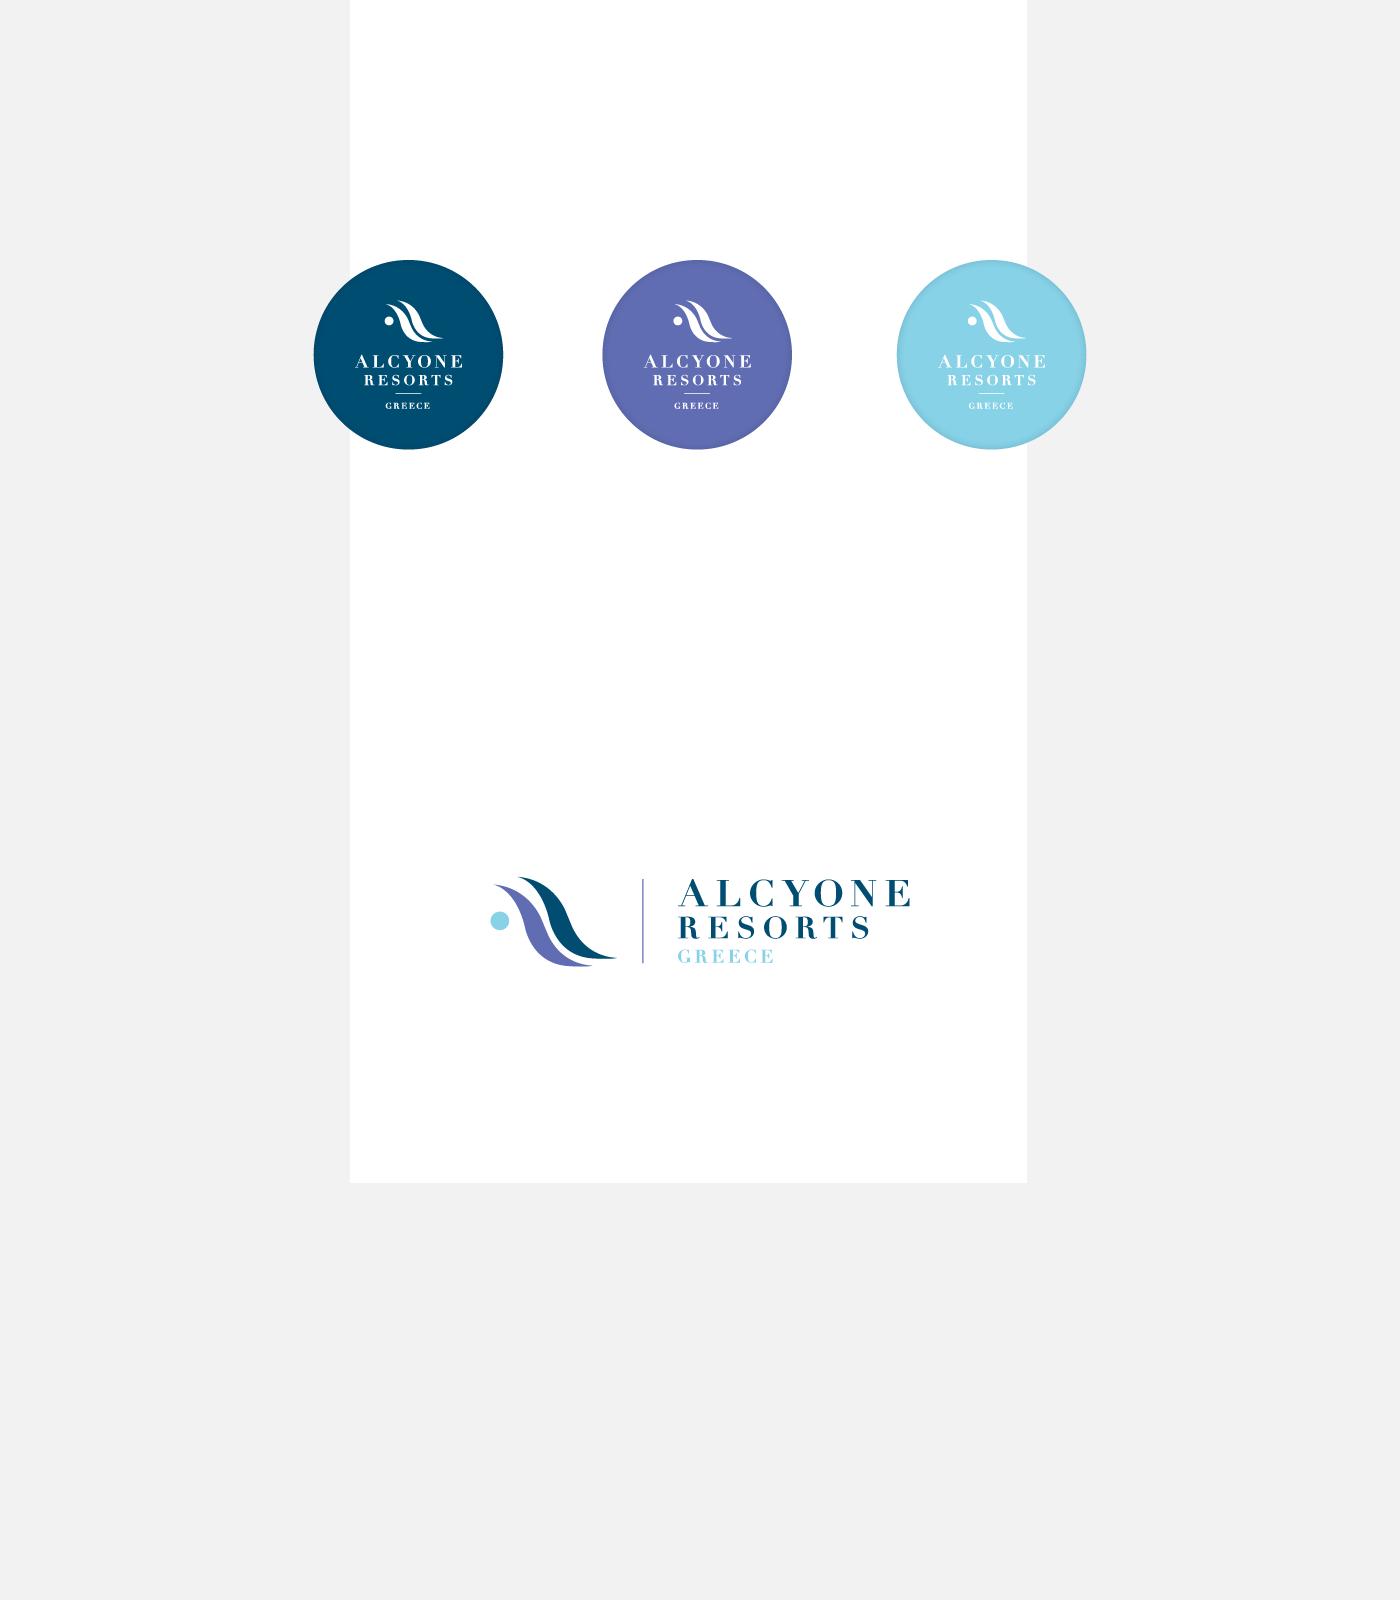 Alcyone Apartments: Resorts Branding On Behance